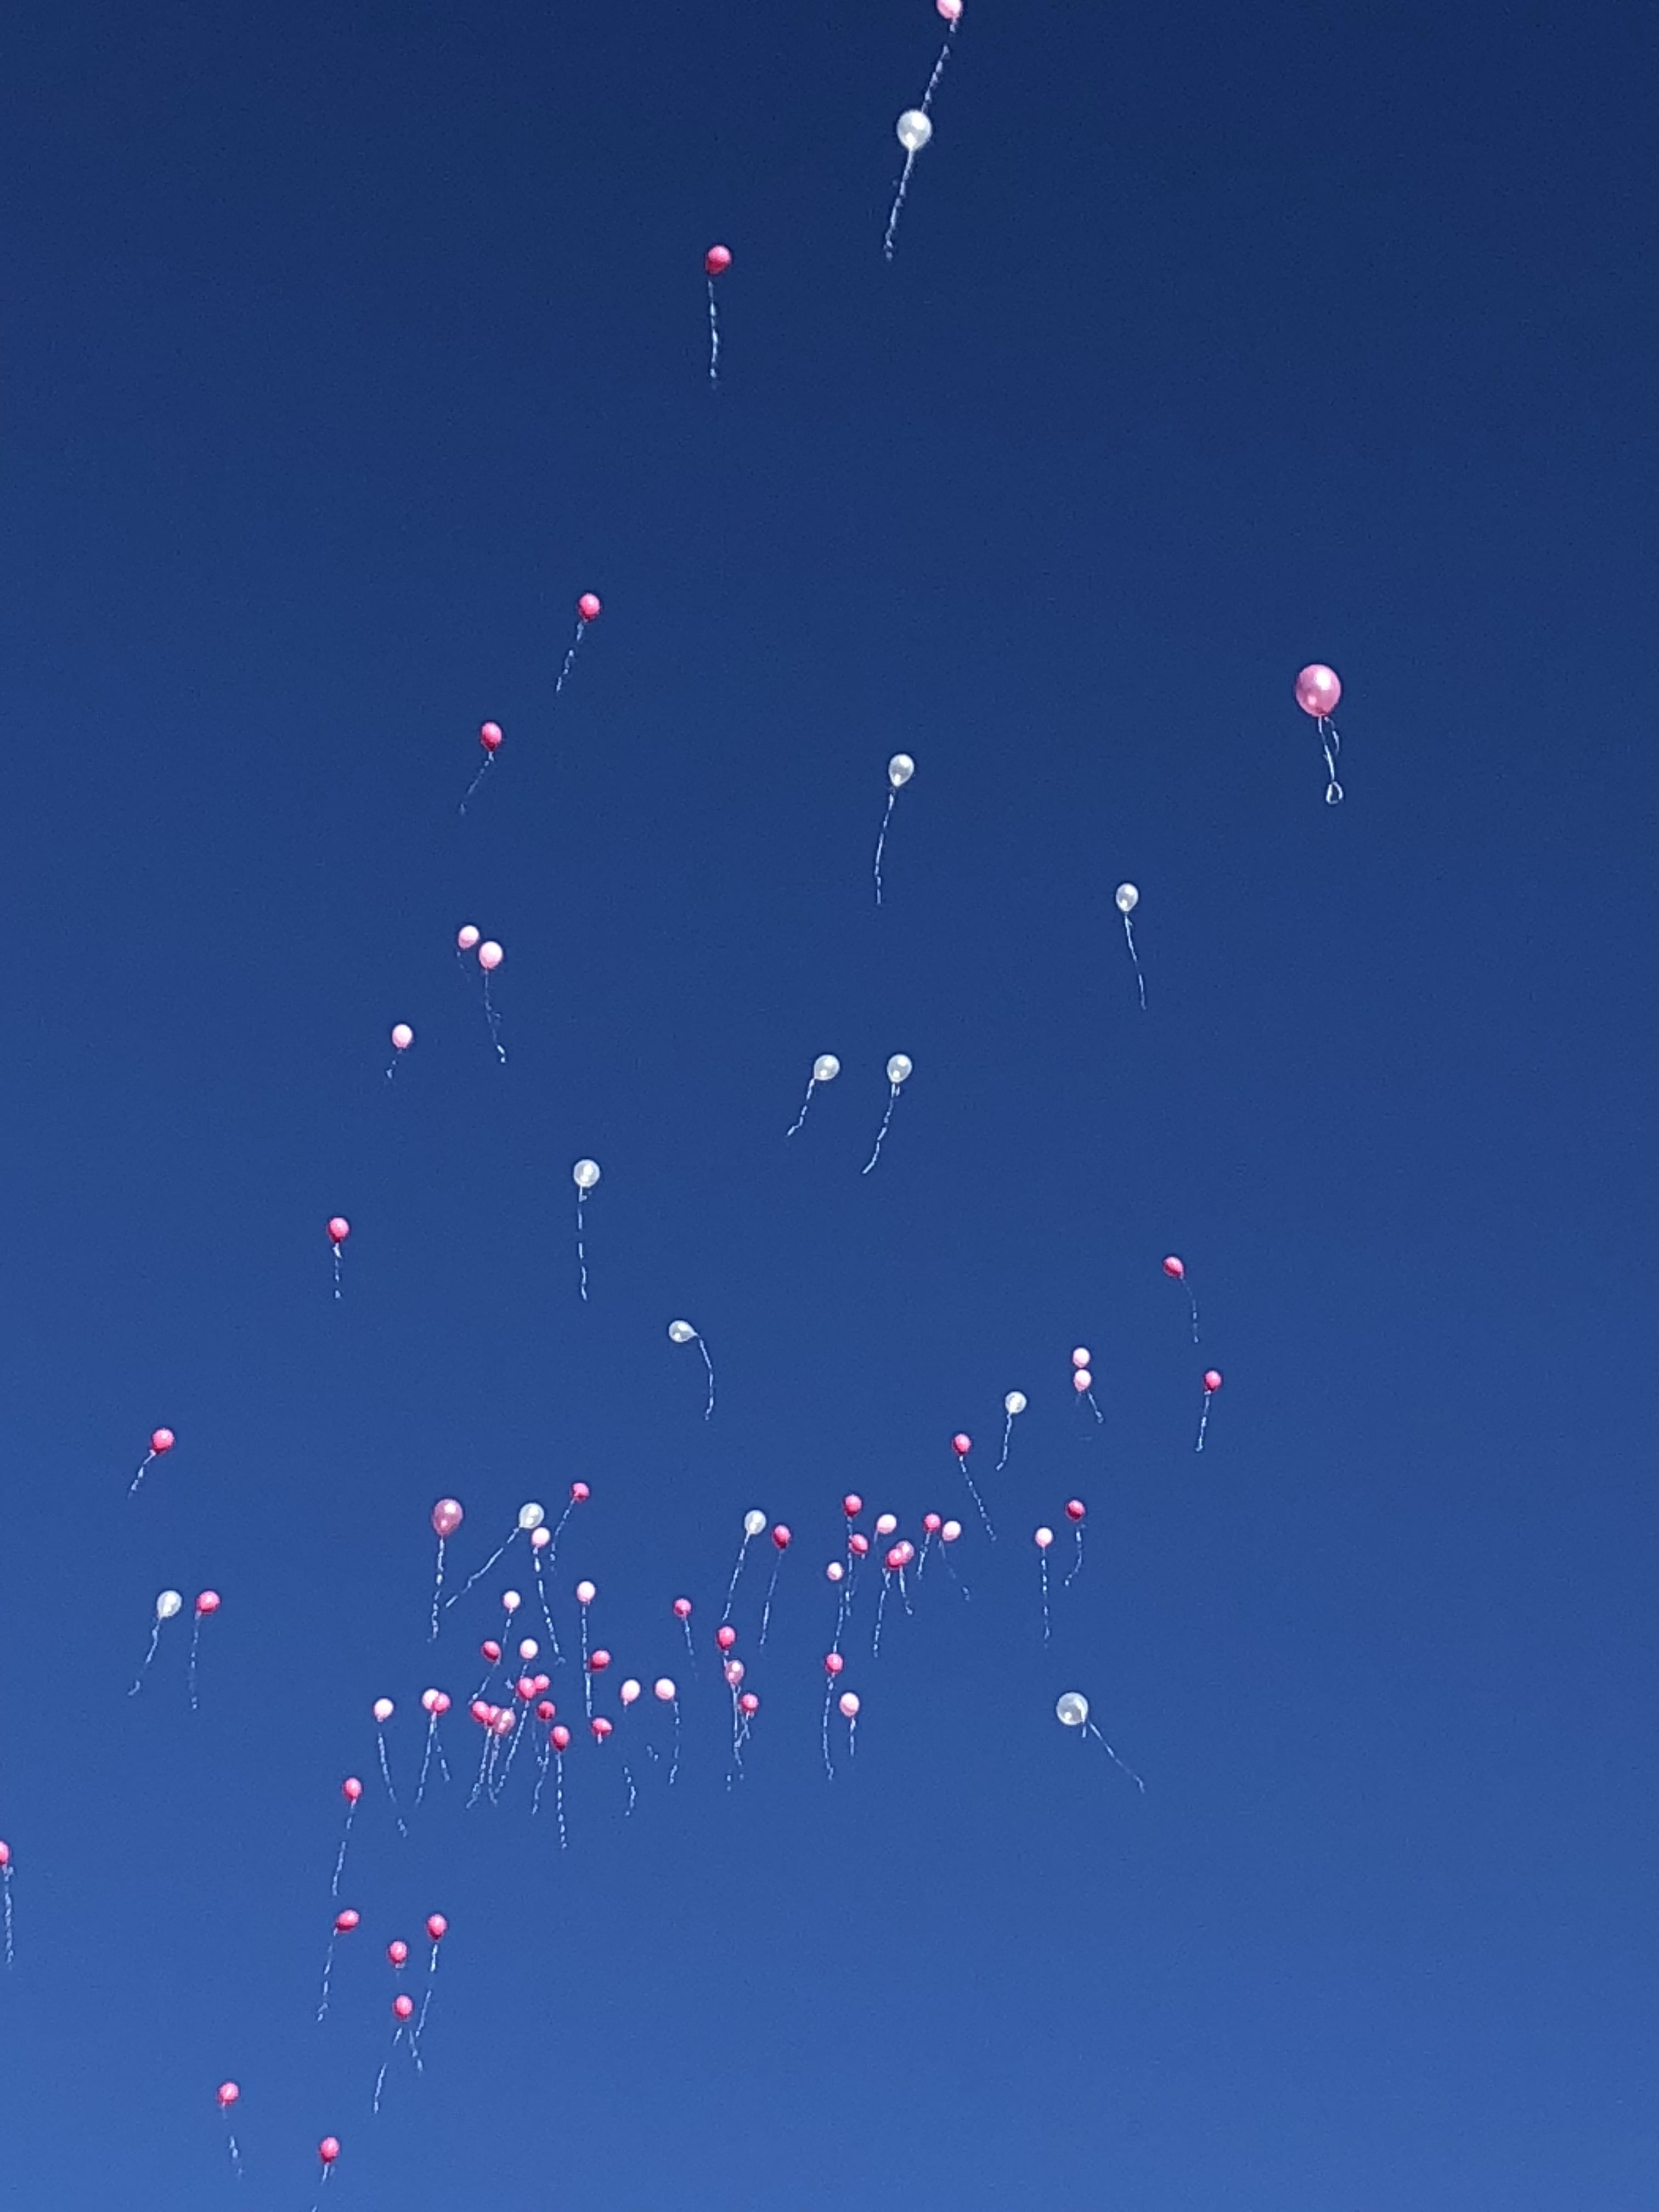 Ballonnen uitvaart afscheid jong meisje